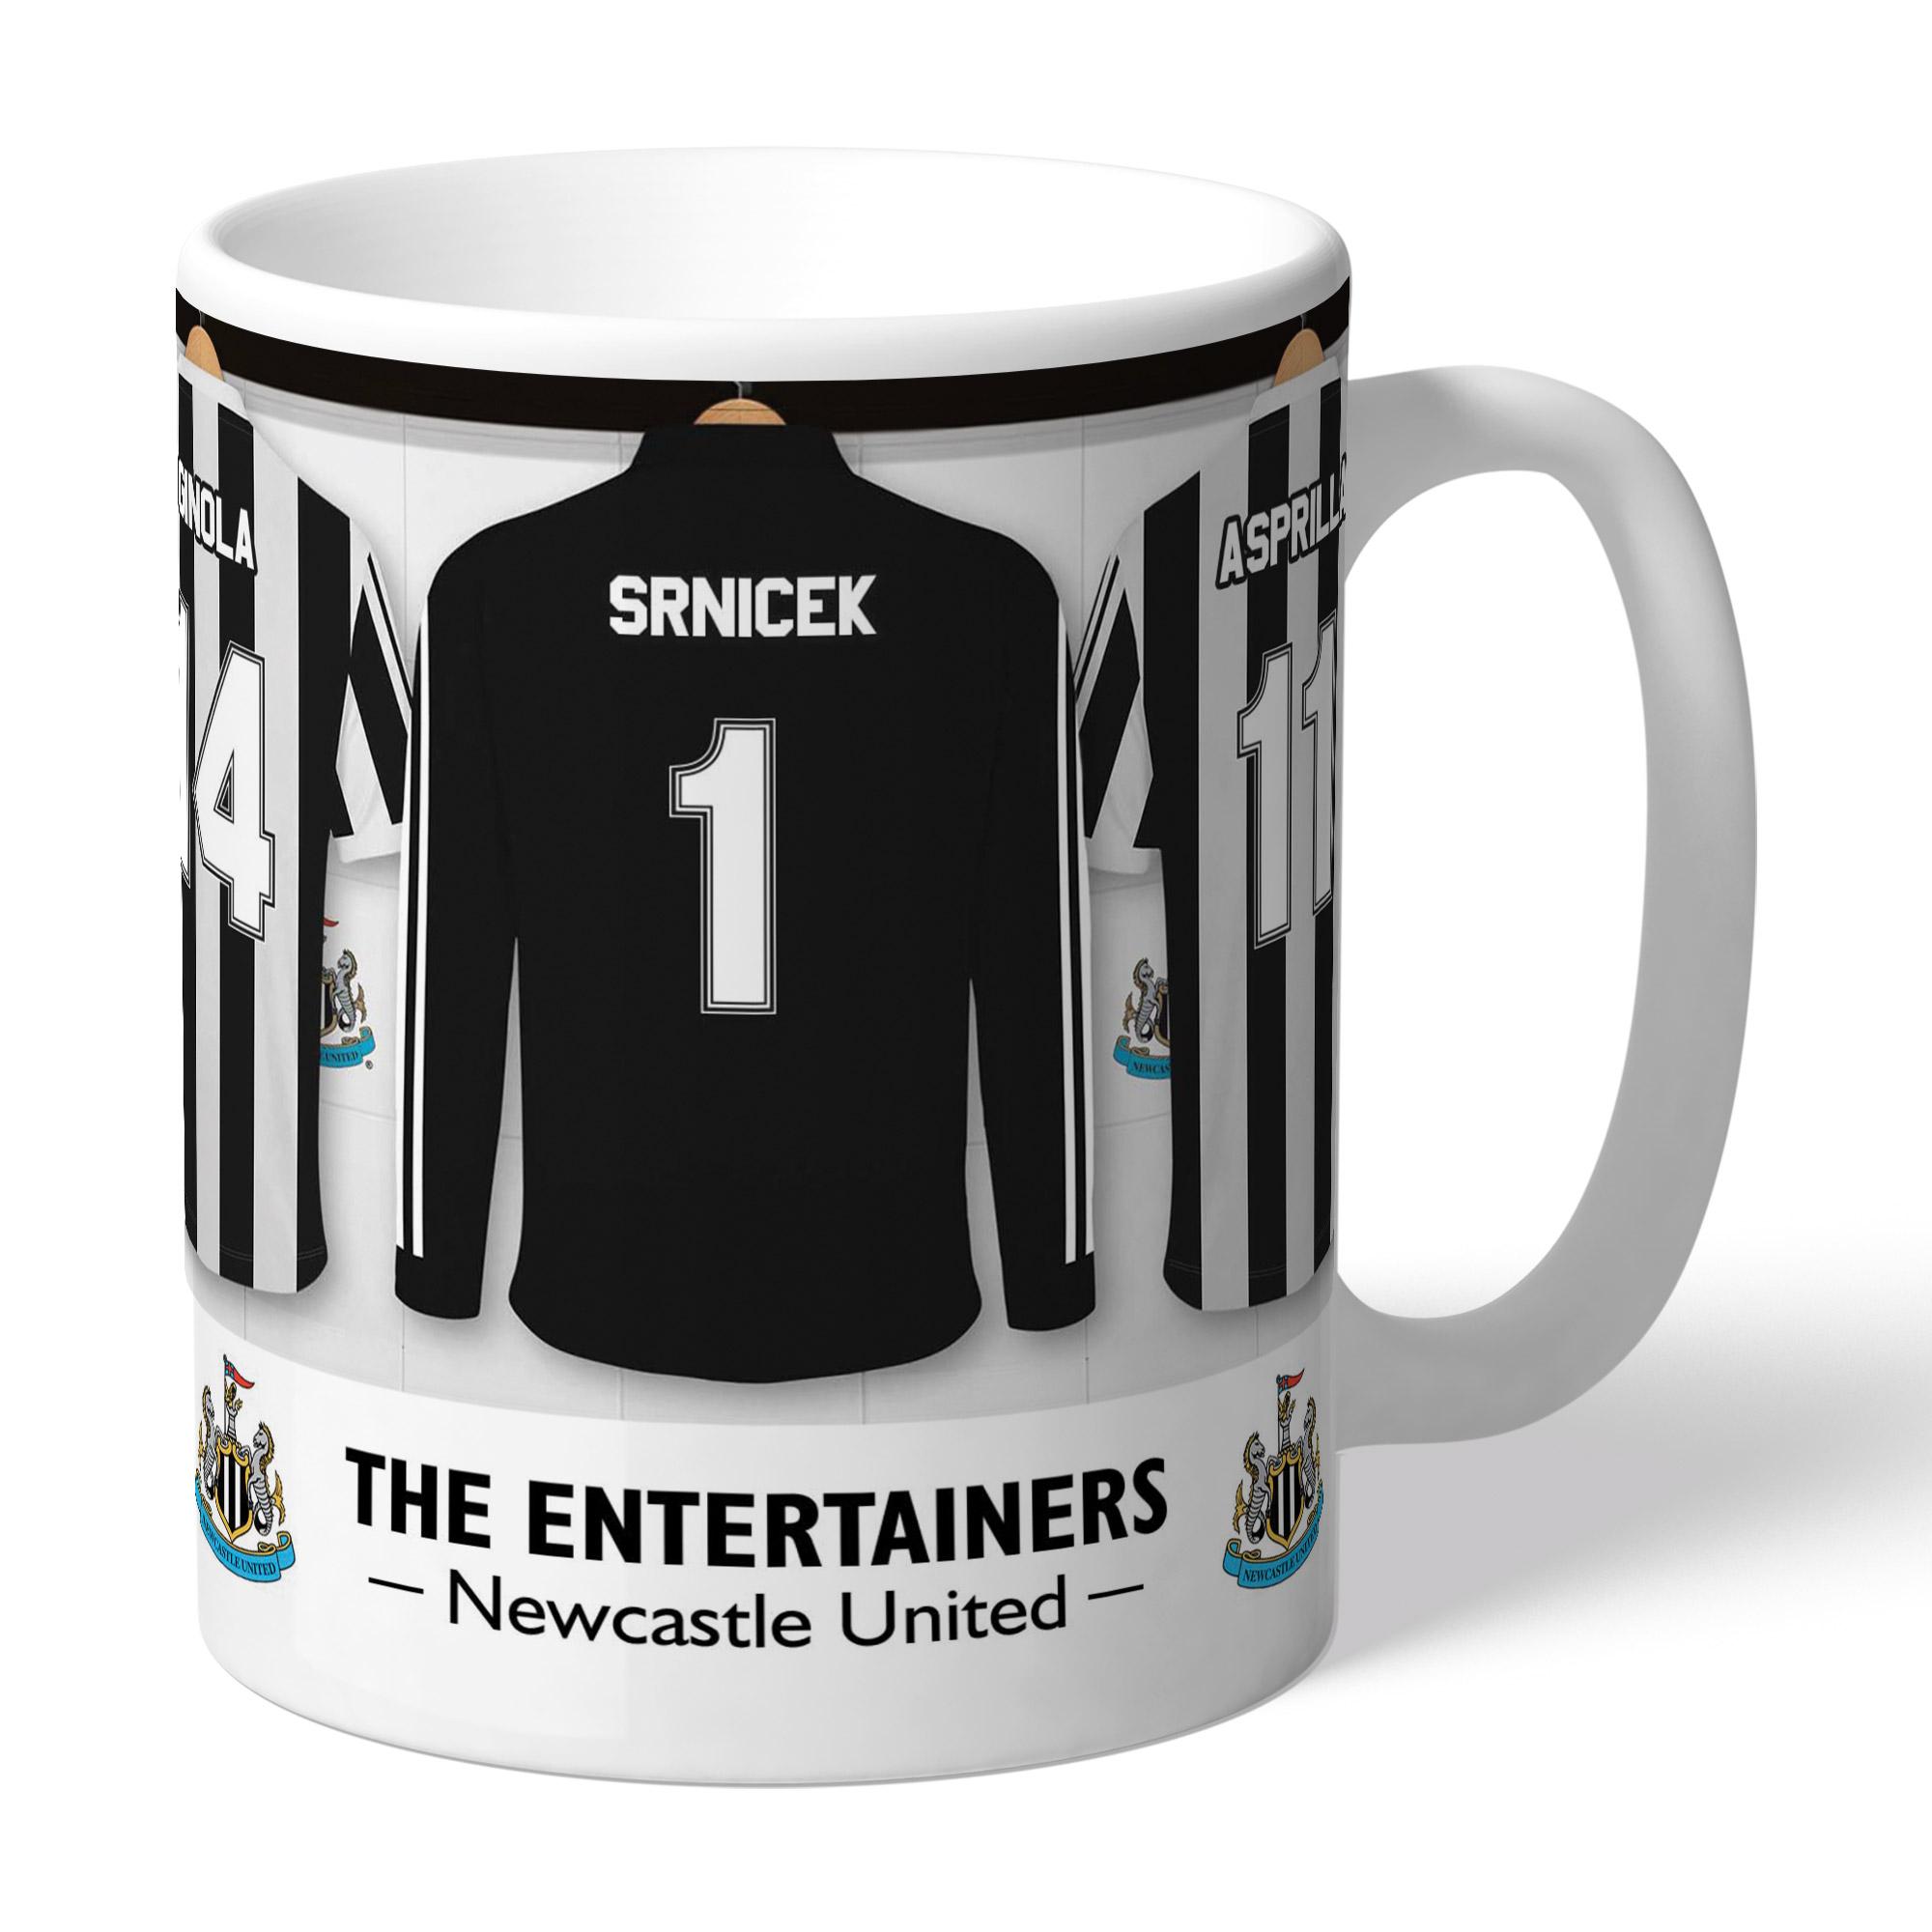 Newcastle United FC 'The Entertainers' Dressing Room Mug